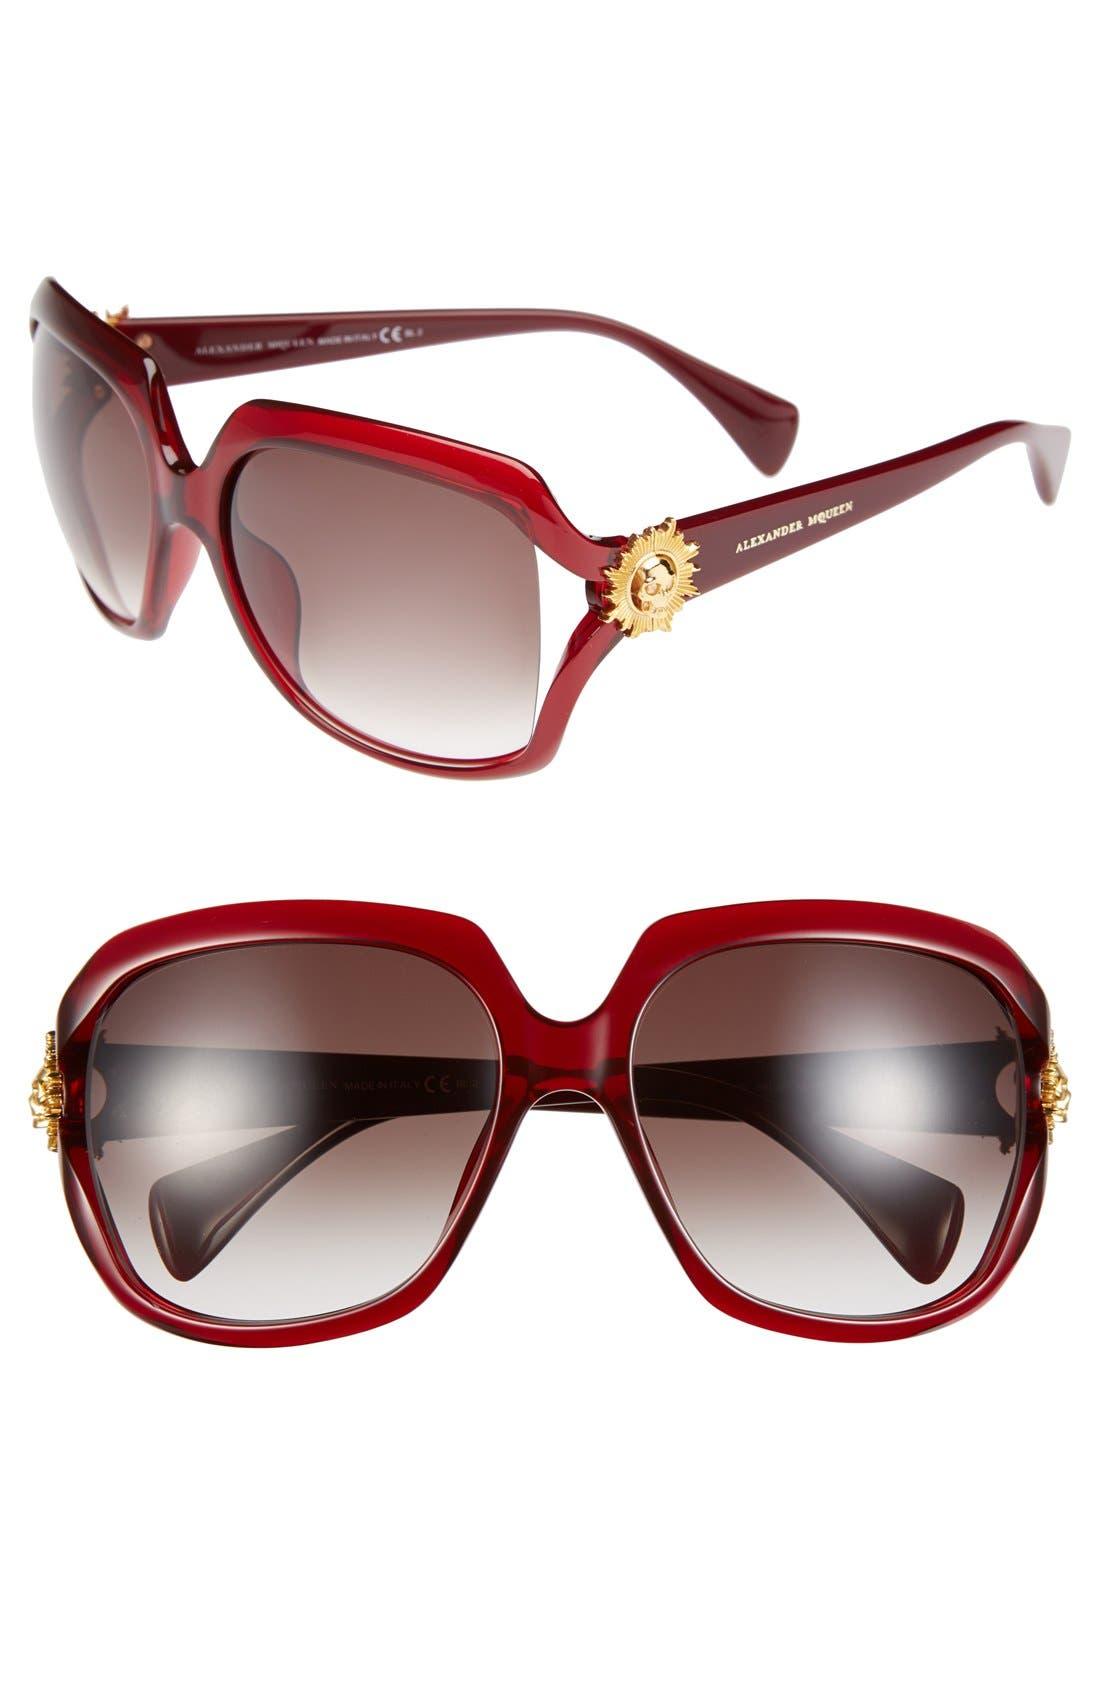 Main Image - Alexander McQueen 59mm Sunglasses